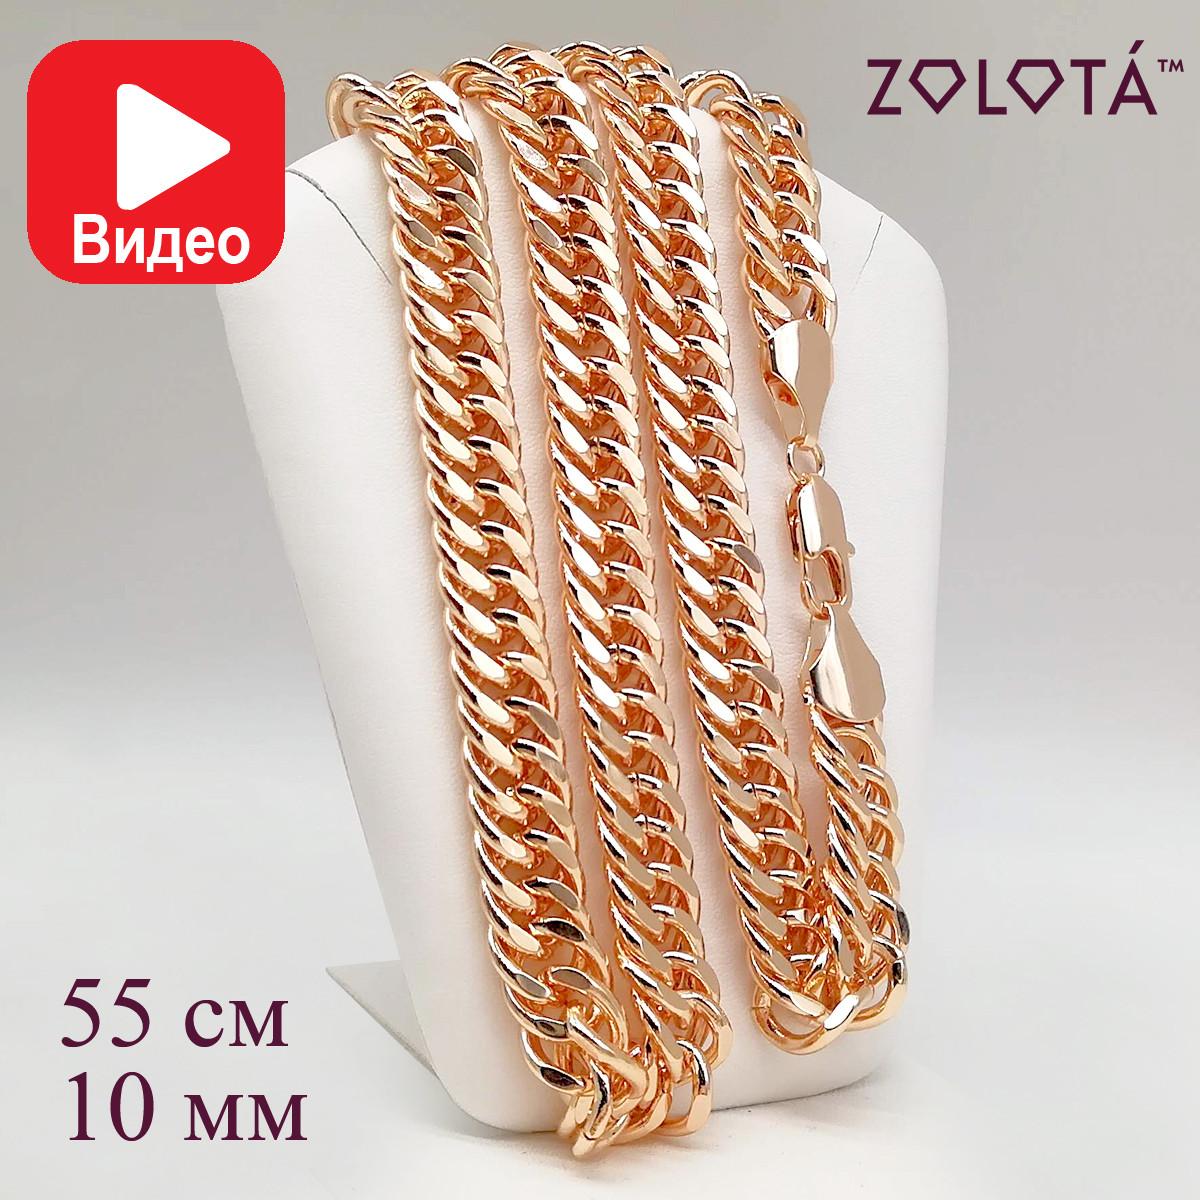 "Цепочка ""Панцирь"", длина 55 см, ширина 10 мм, вес 106 г, позолота РО, ЗЛ00754 (55 см)"